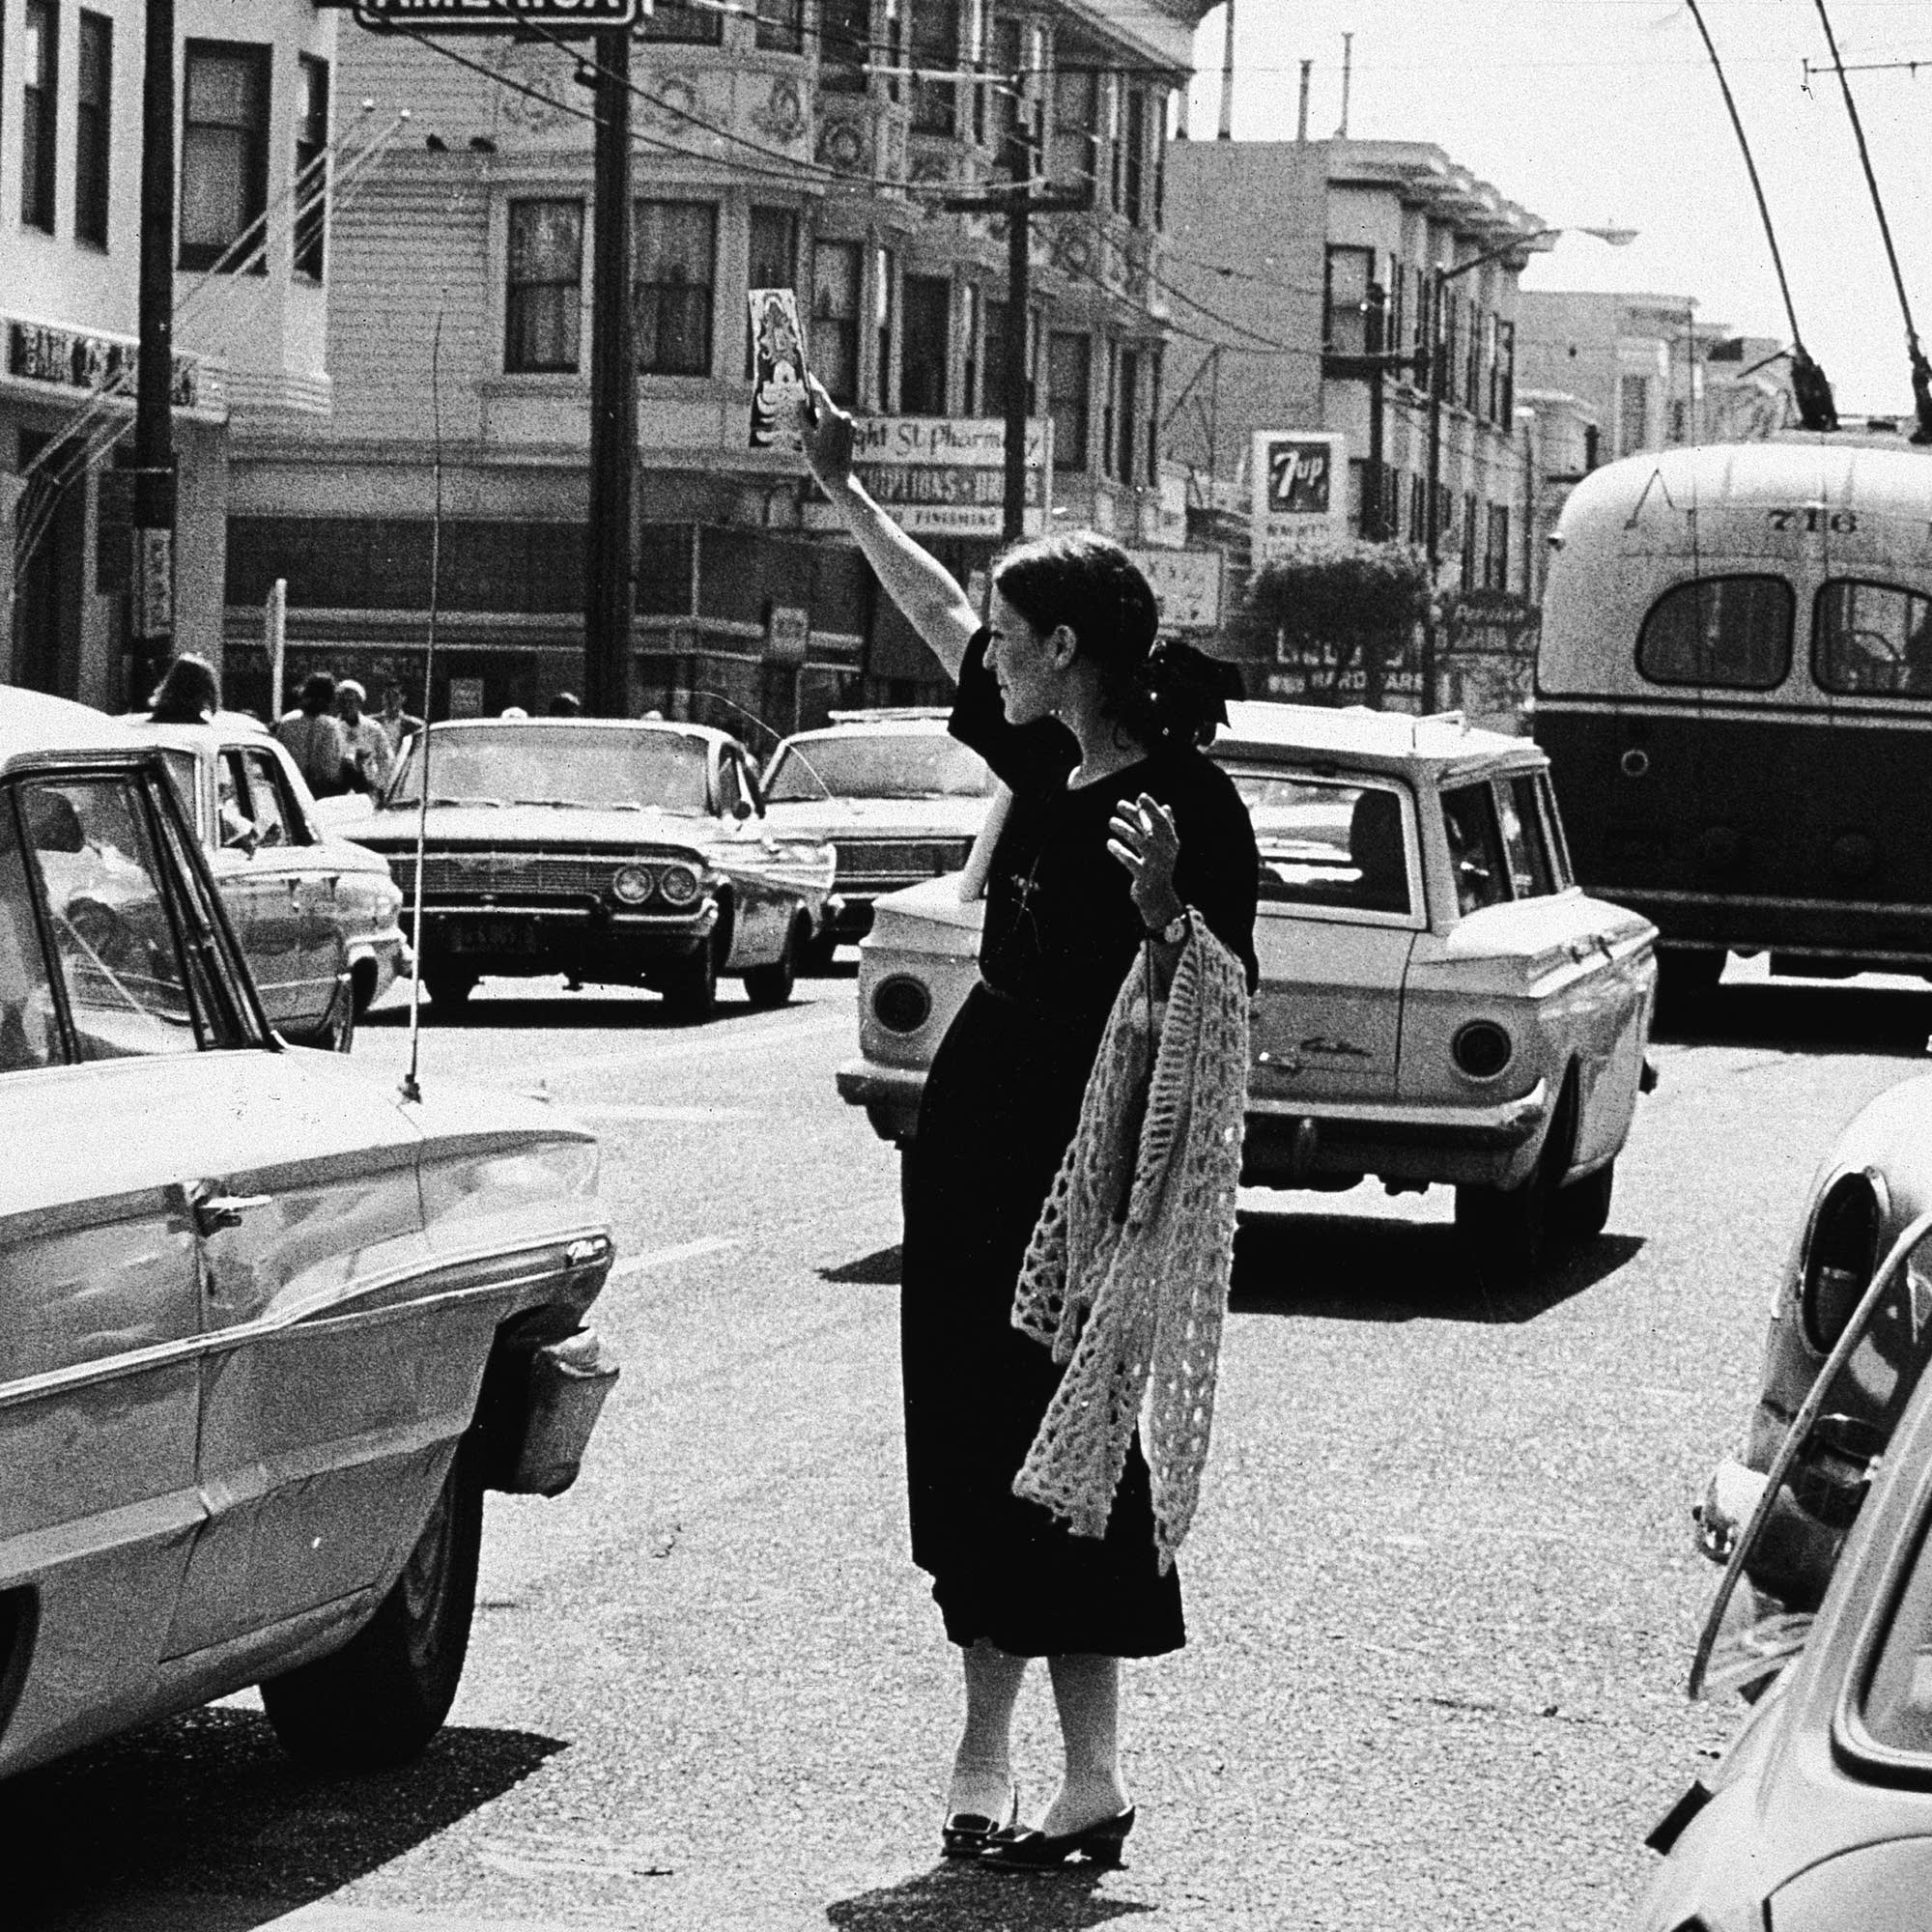 A hippie in San Francisco, 1967